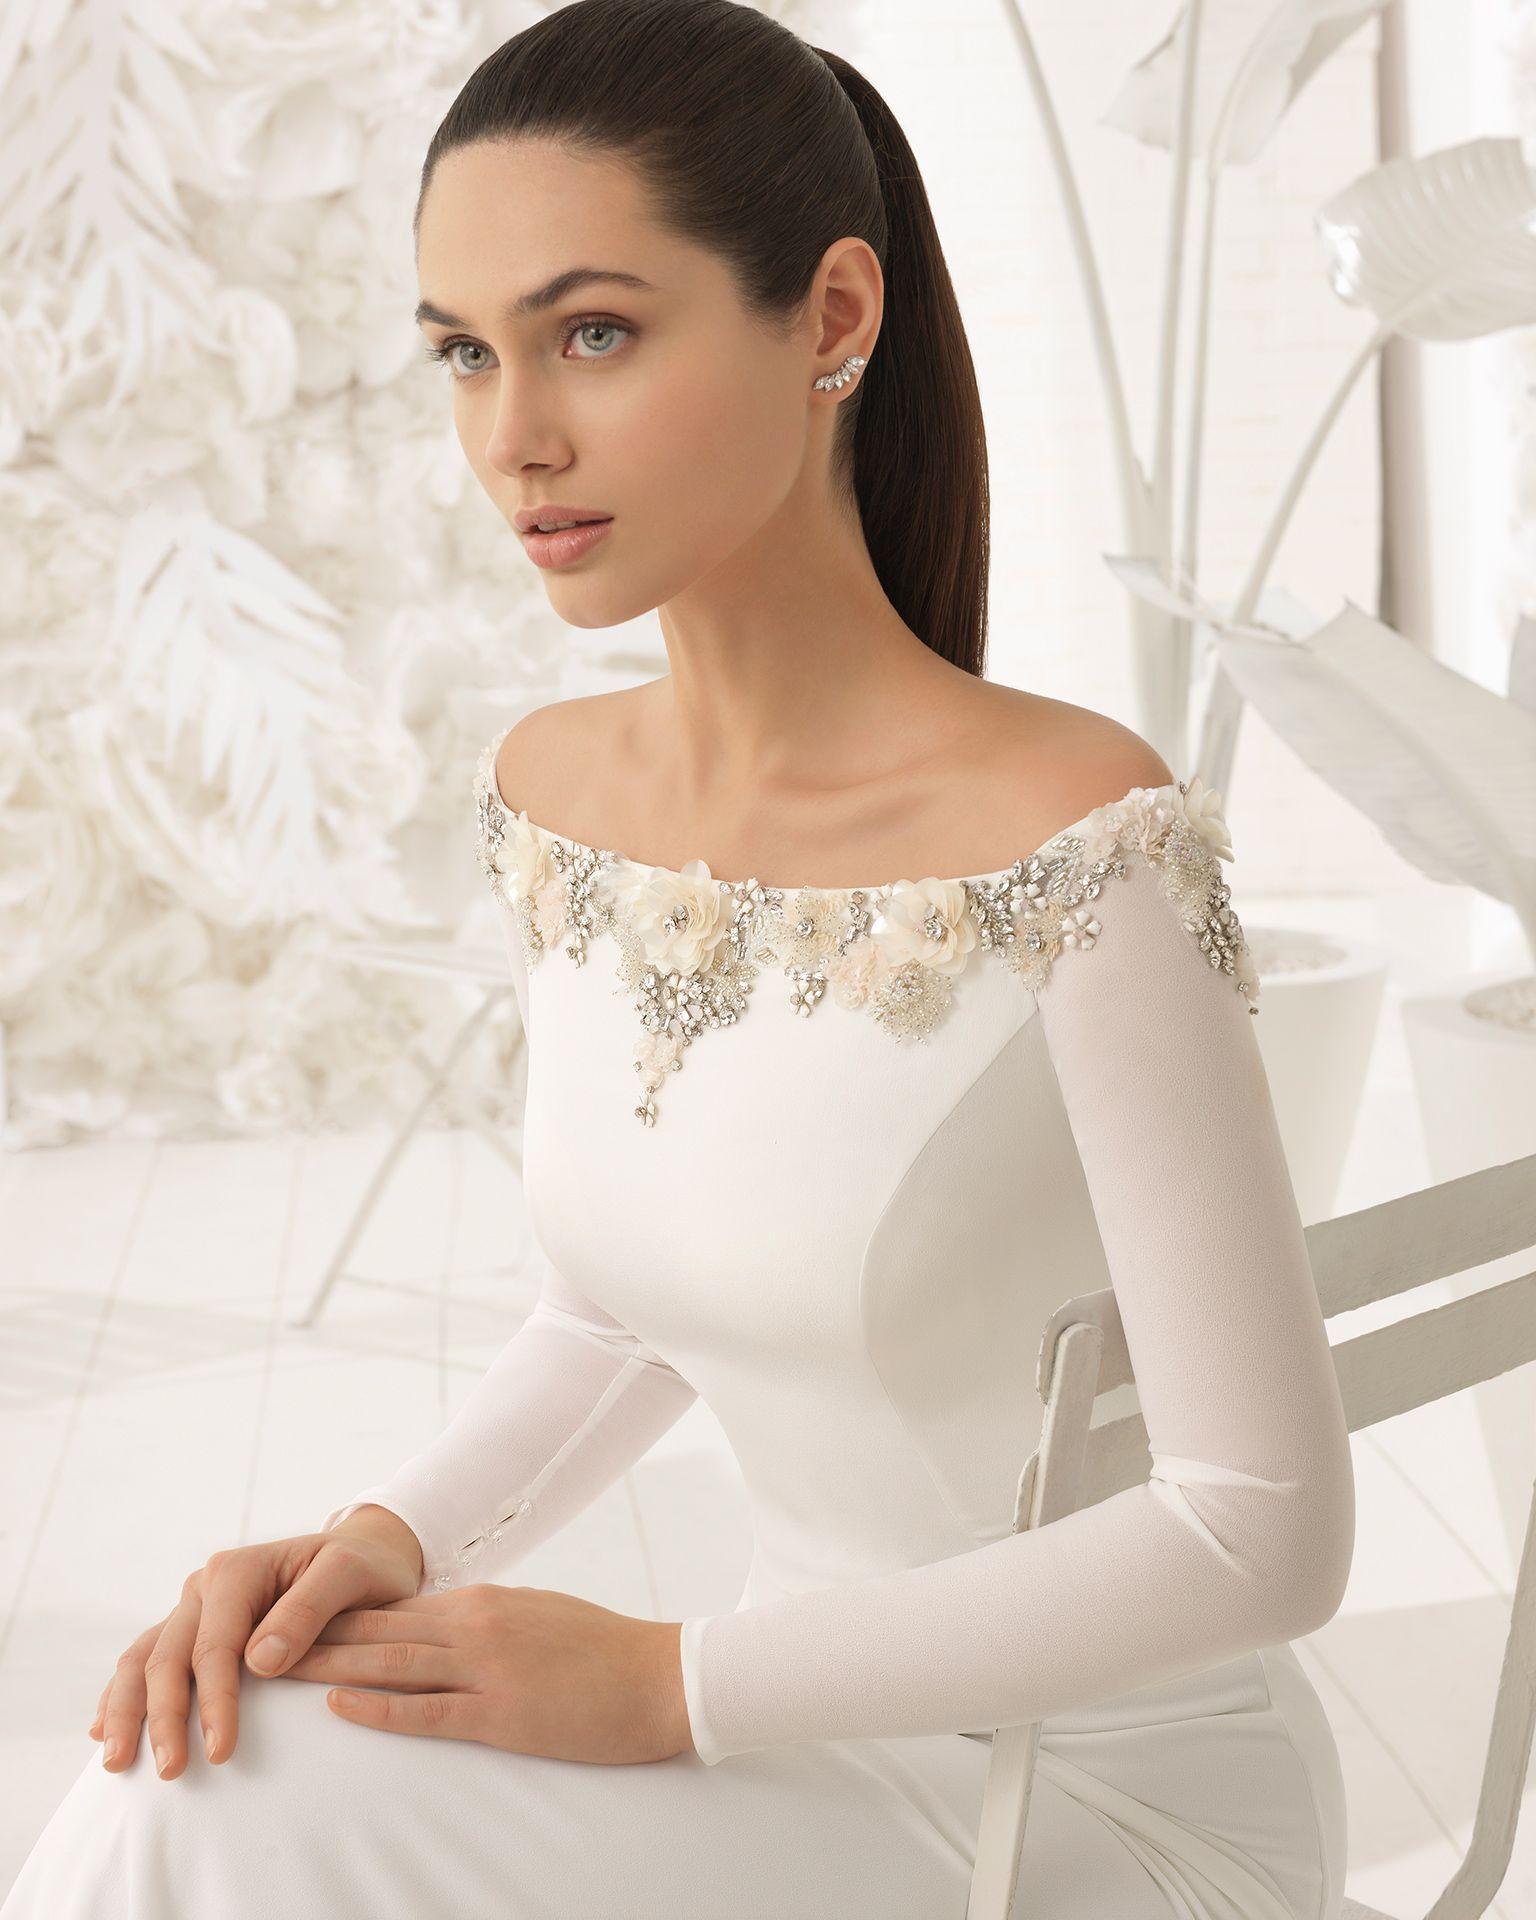 Crystal Design 2018 Wedding Dresses Royal Garden Haute Couture Bridal Collections Wedding Inspirasi Wedding Dresses Sheer Wedding Dress Crystal Wedding Dresses [ 1604 x 900 Pixel ]